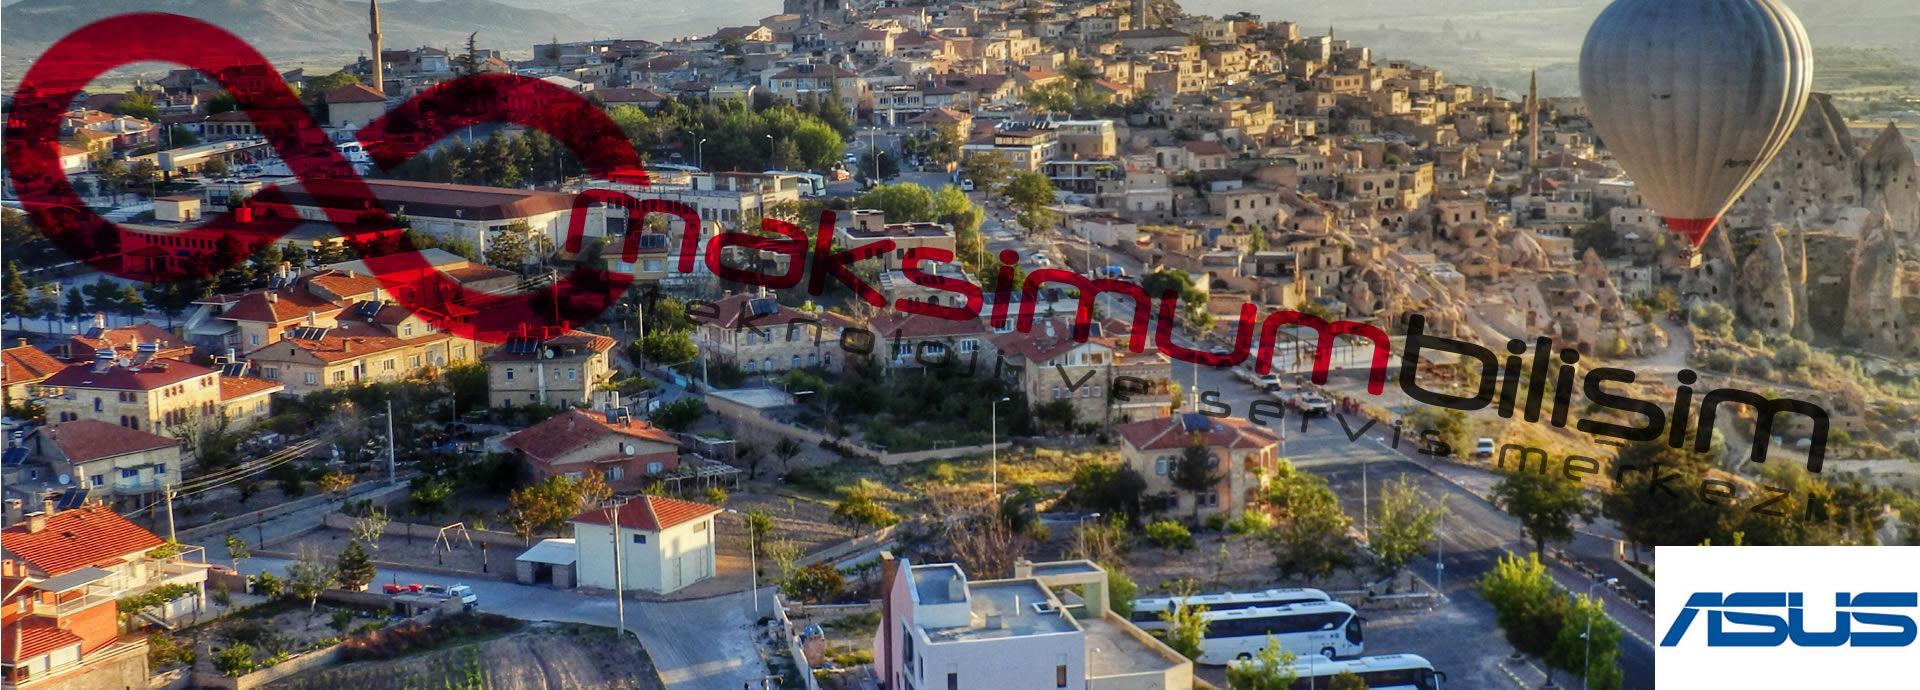 asus servis nevşehir